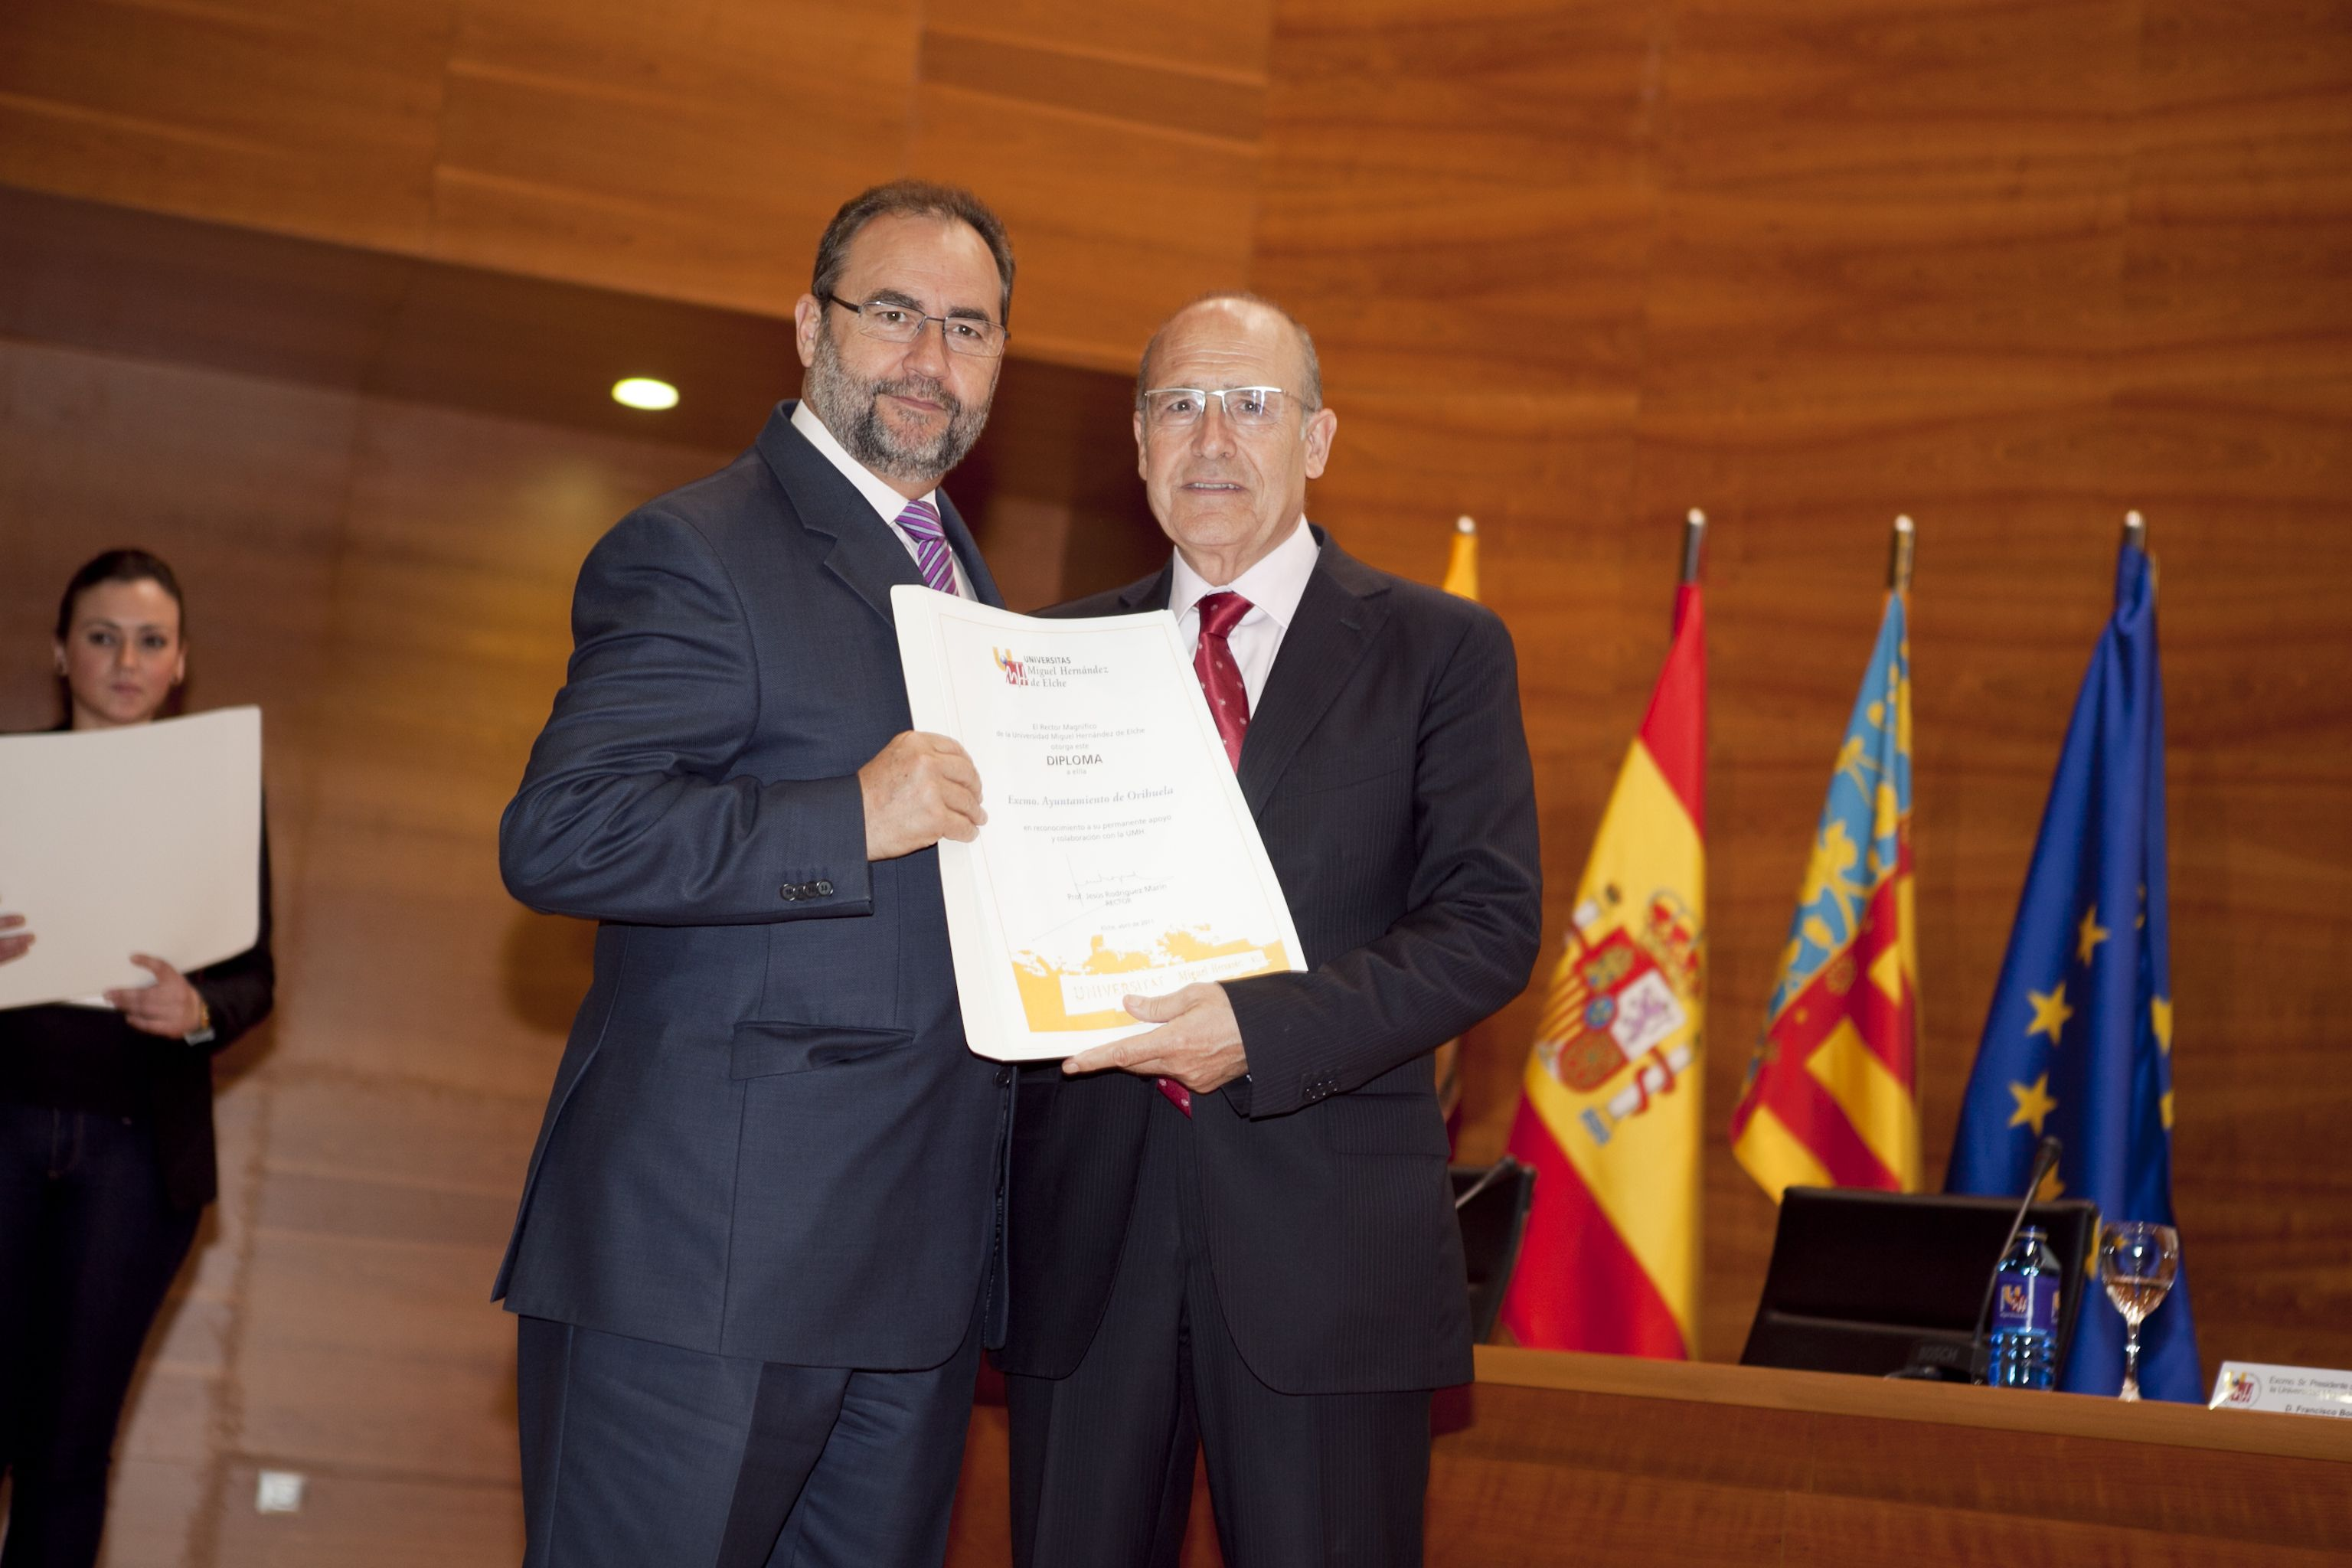 umh-diplomas-rector_mg_7024.jpg